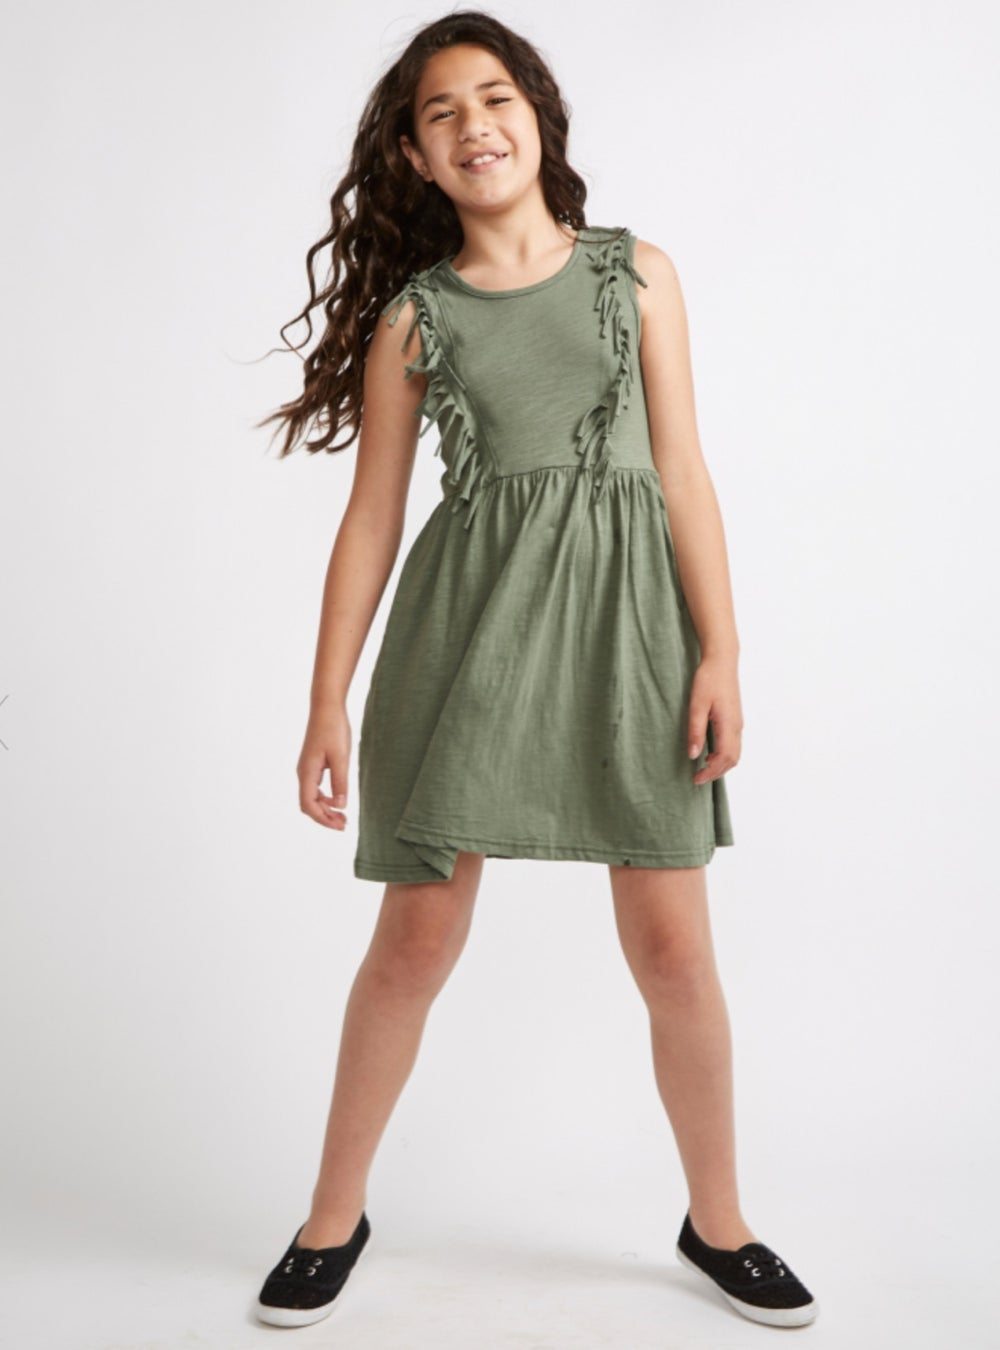 Image of Khaki girls dress